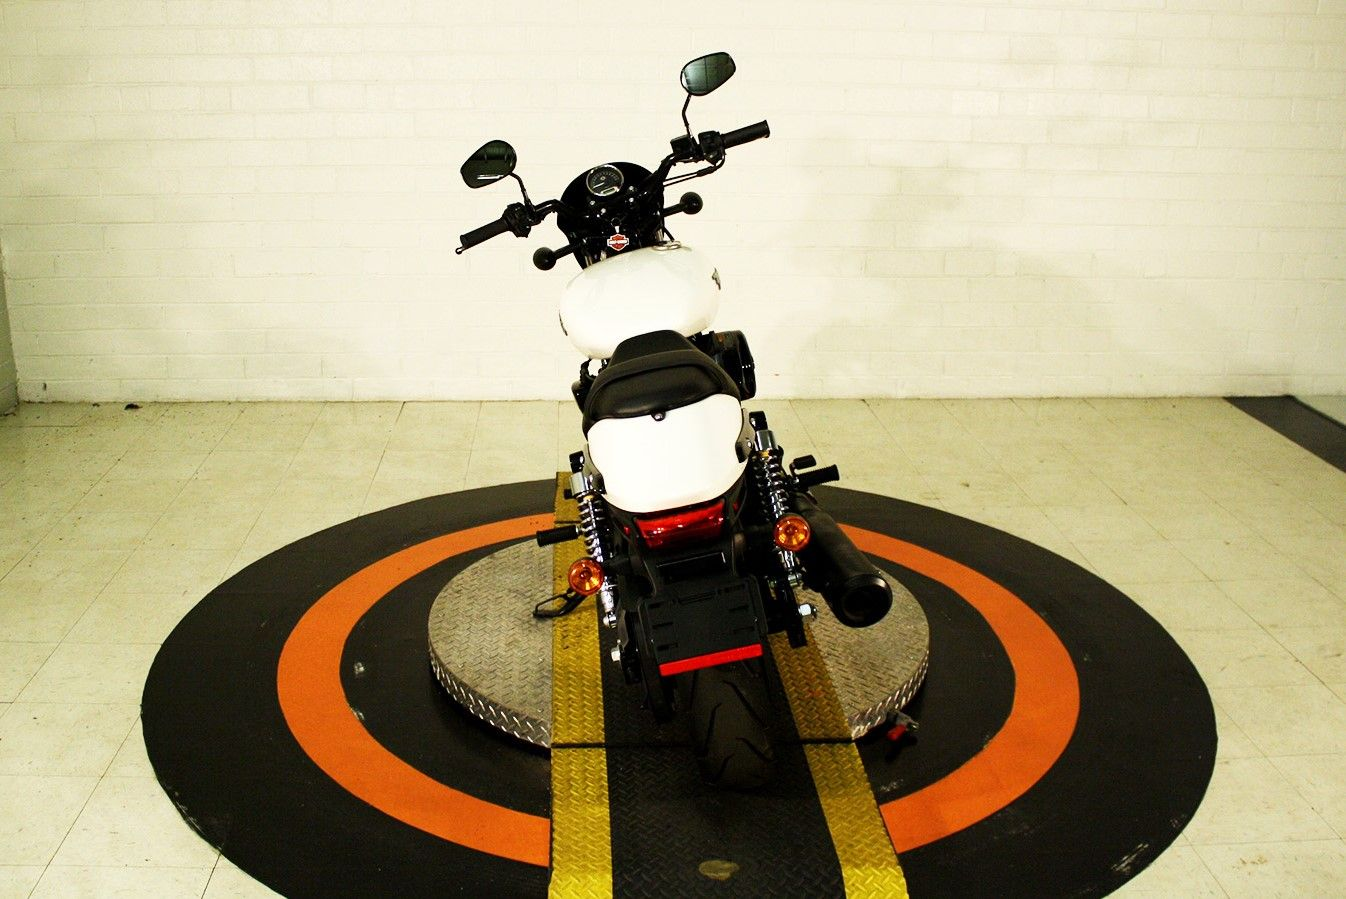 Pre-Owned 2018 Harley-Davidson Street 750